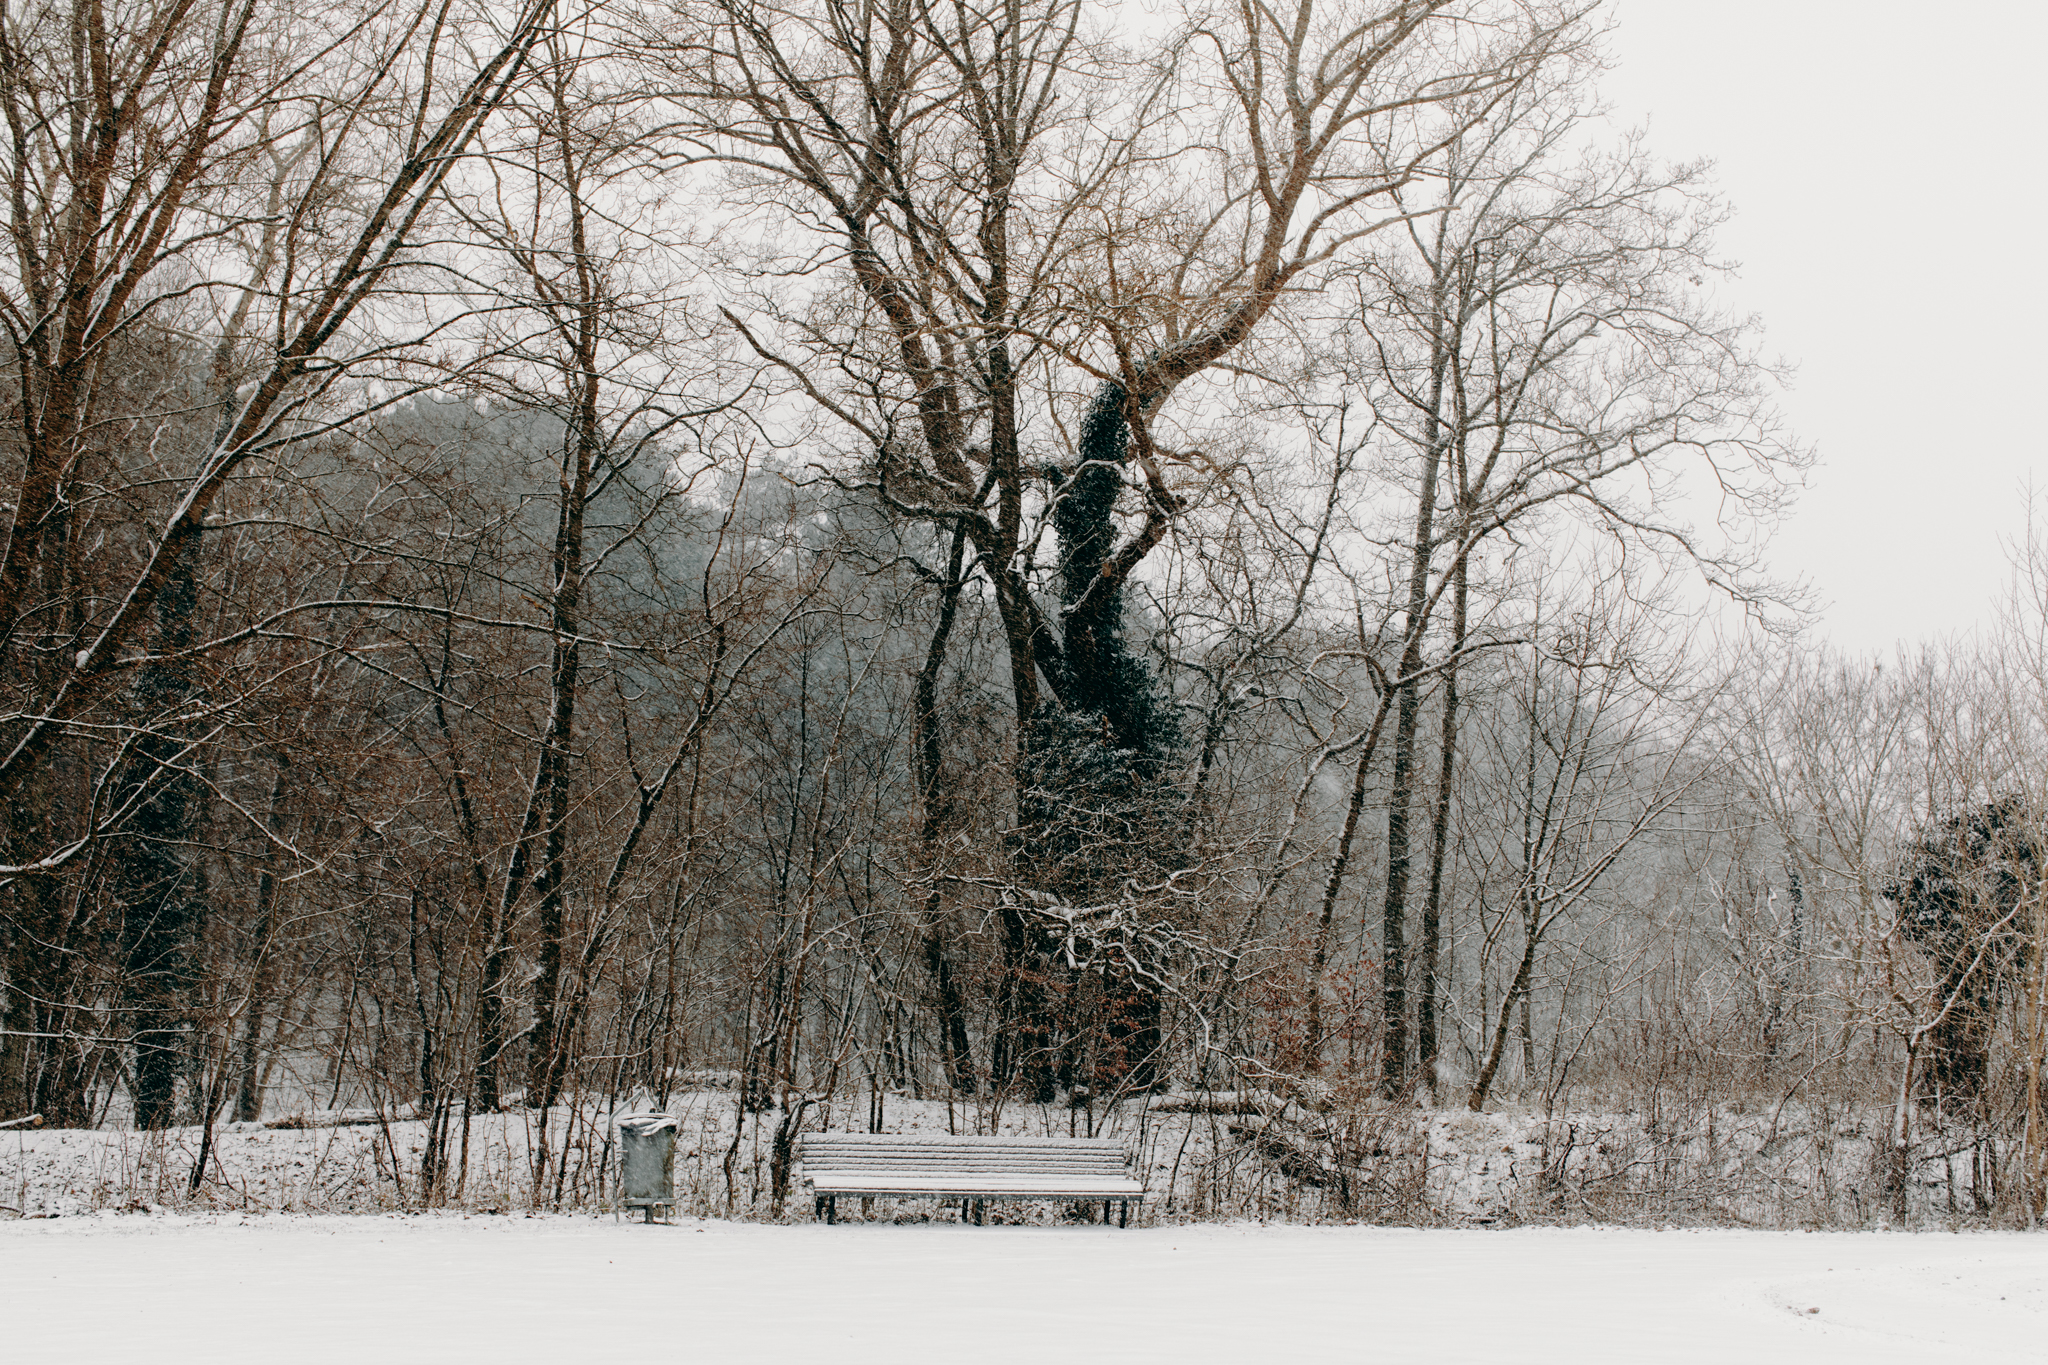 006-winter-sneeuw-oosterplas-bloemendaal.jpg